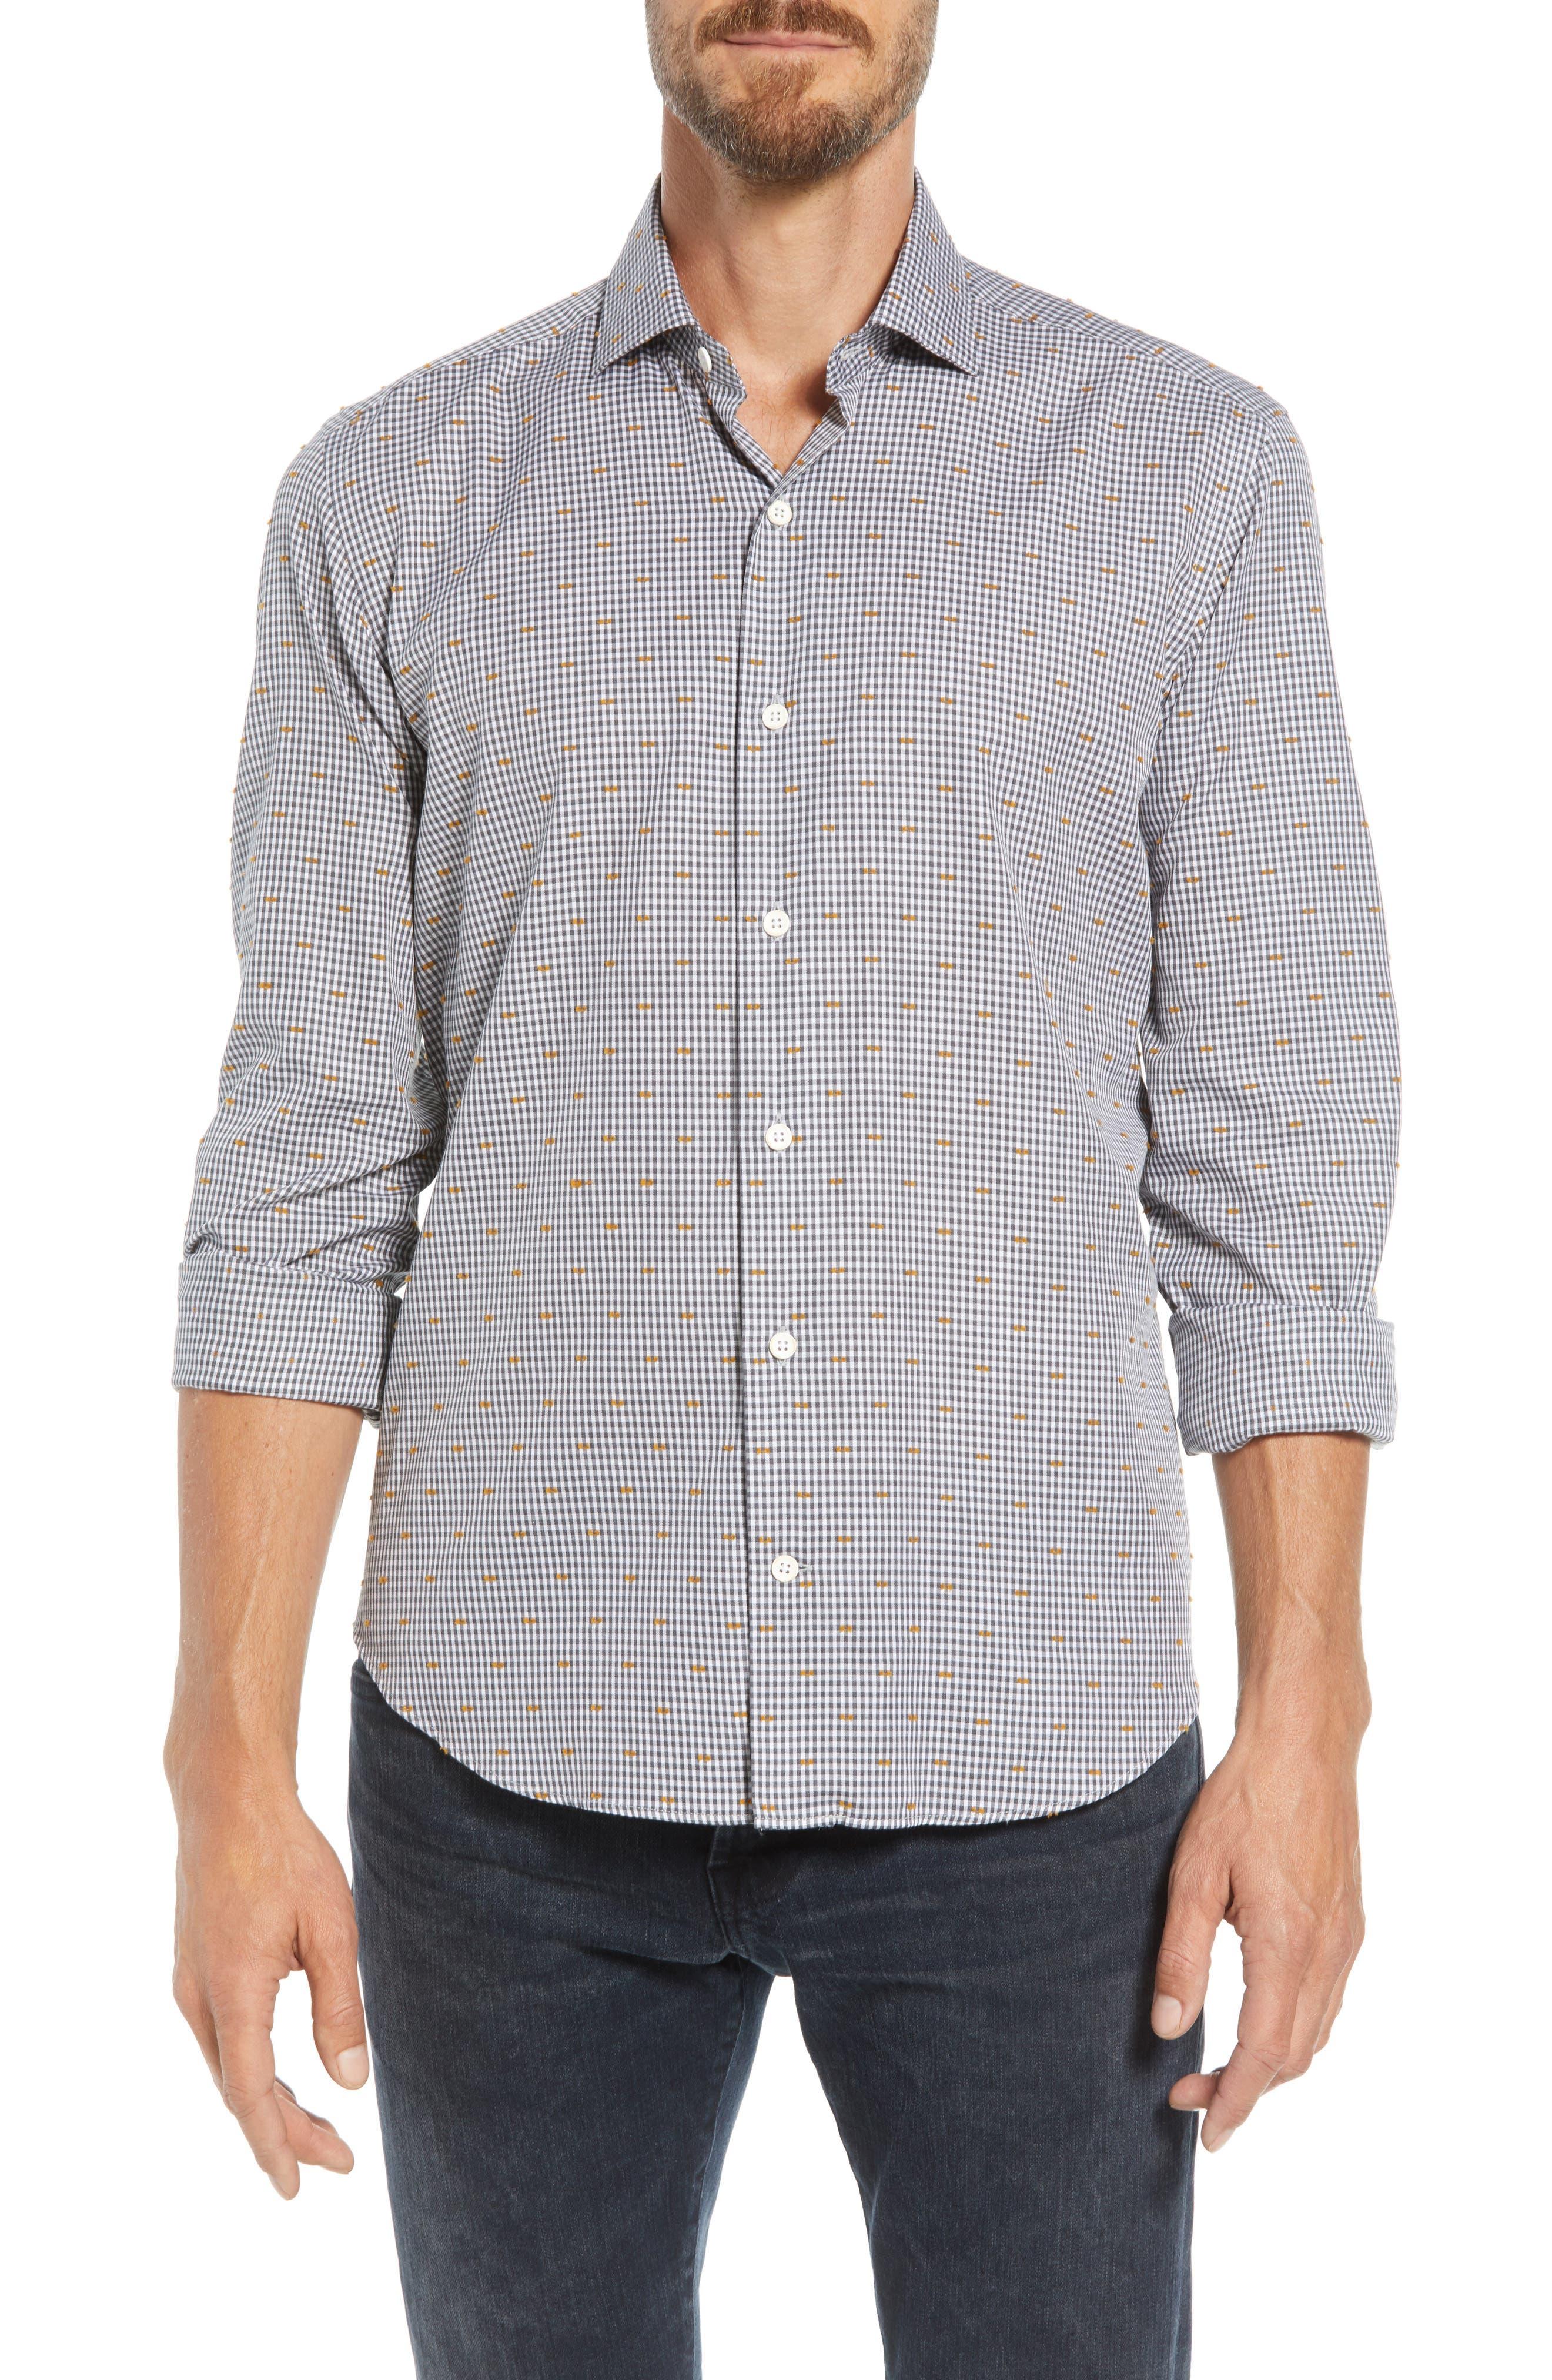 CULTURATA,                             Coupé Dot Tailored Fit Gingham Sport Shirt,                             Main thumbnail 1, color,                             020